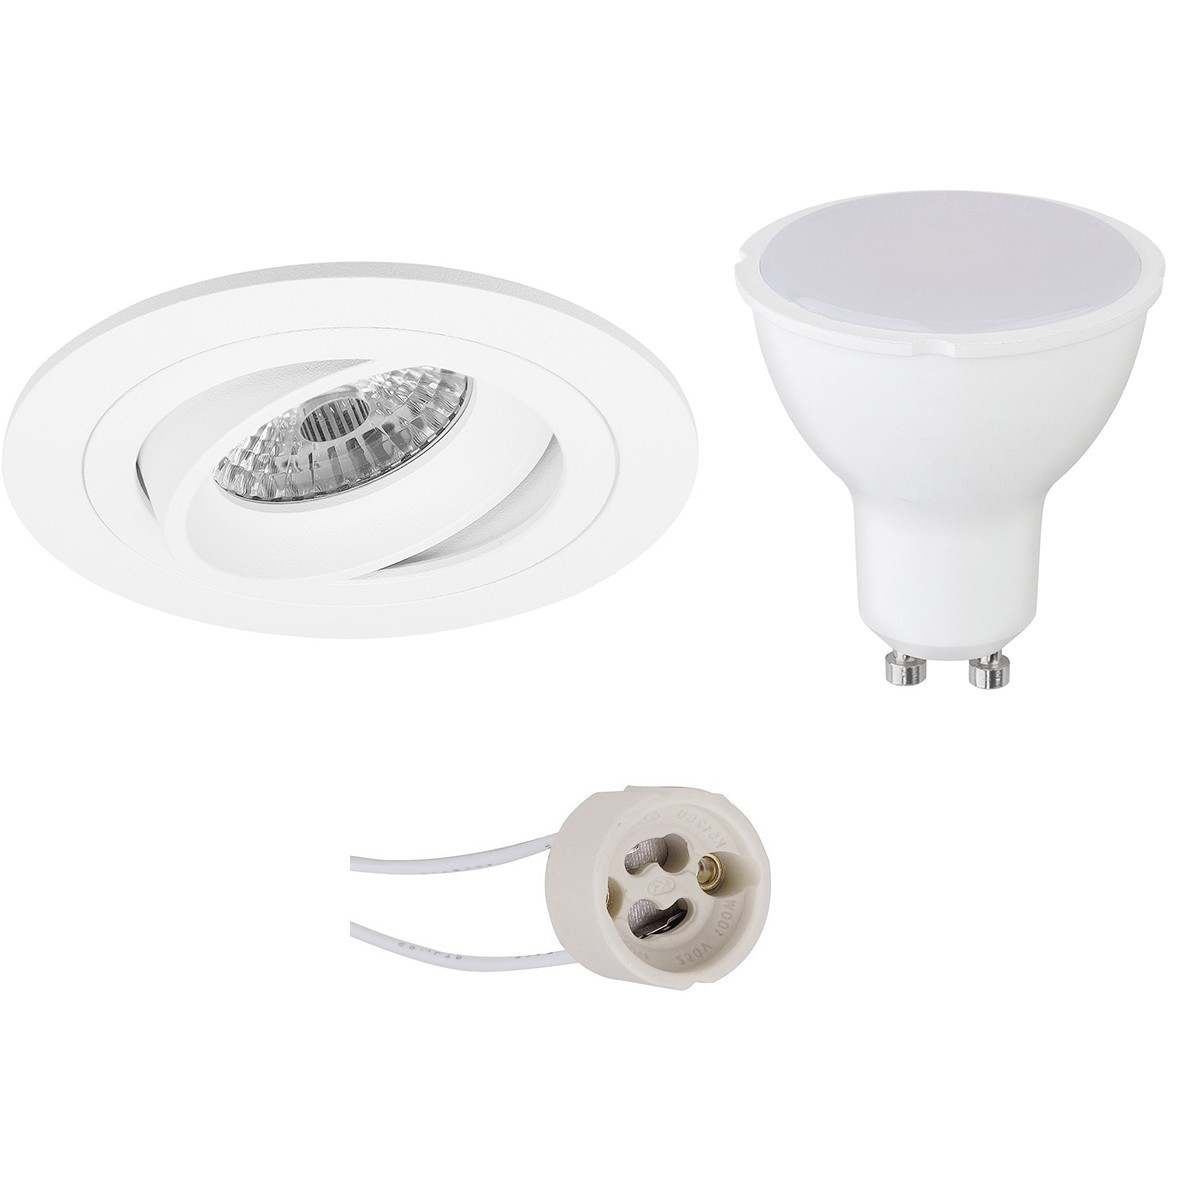 LED Spot Set - Aigi - Pragmi Alpin Pro - GU10 Fitting - Inbouw Rond - Mat Wit - 8W - Helder/Koud Wit